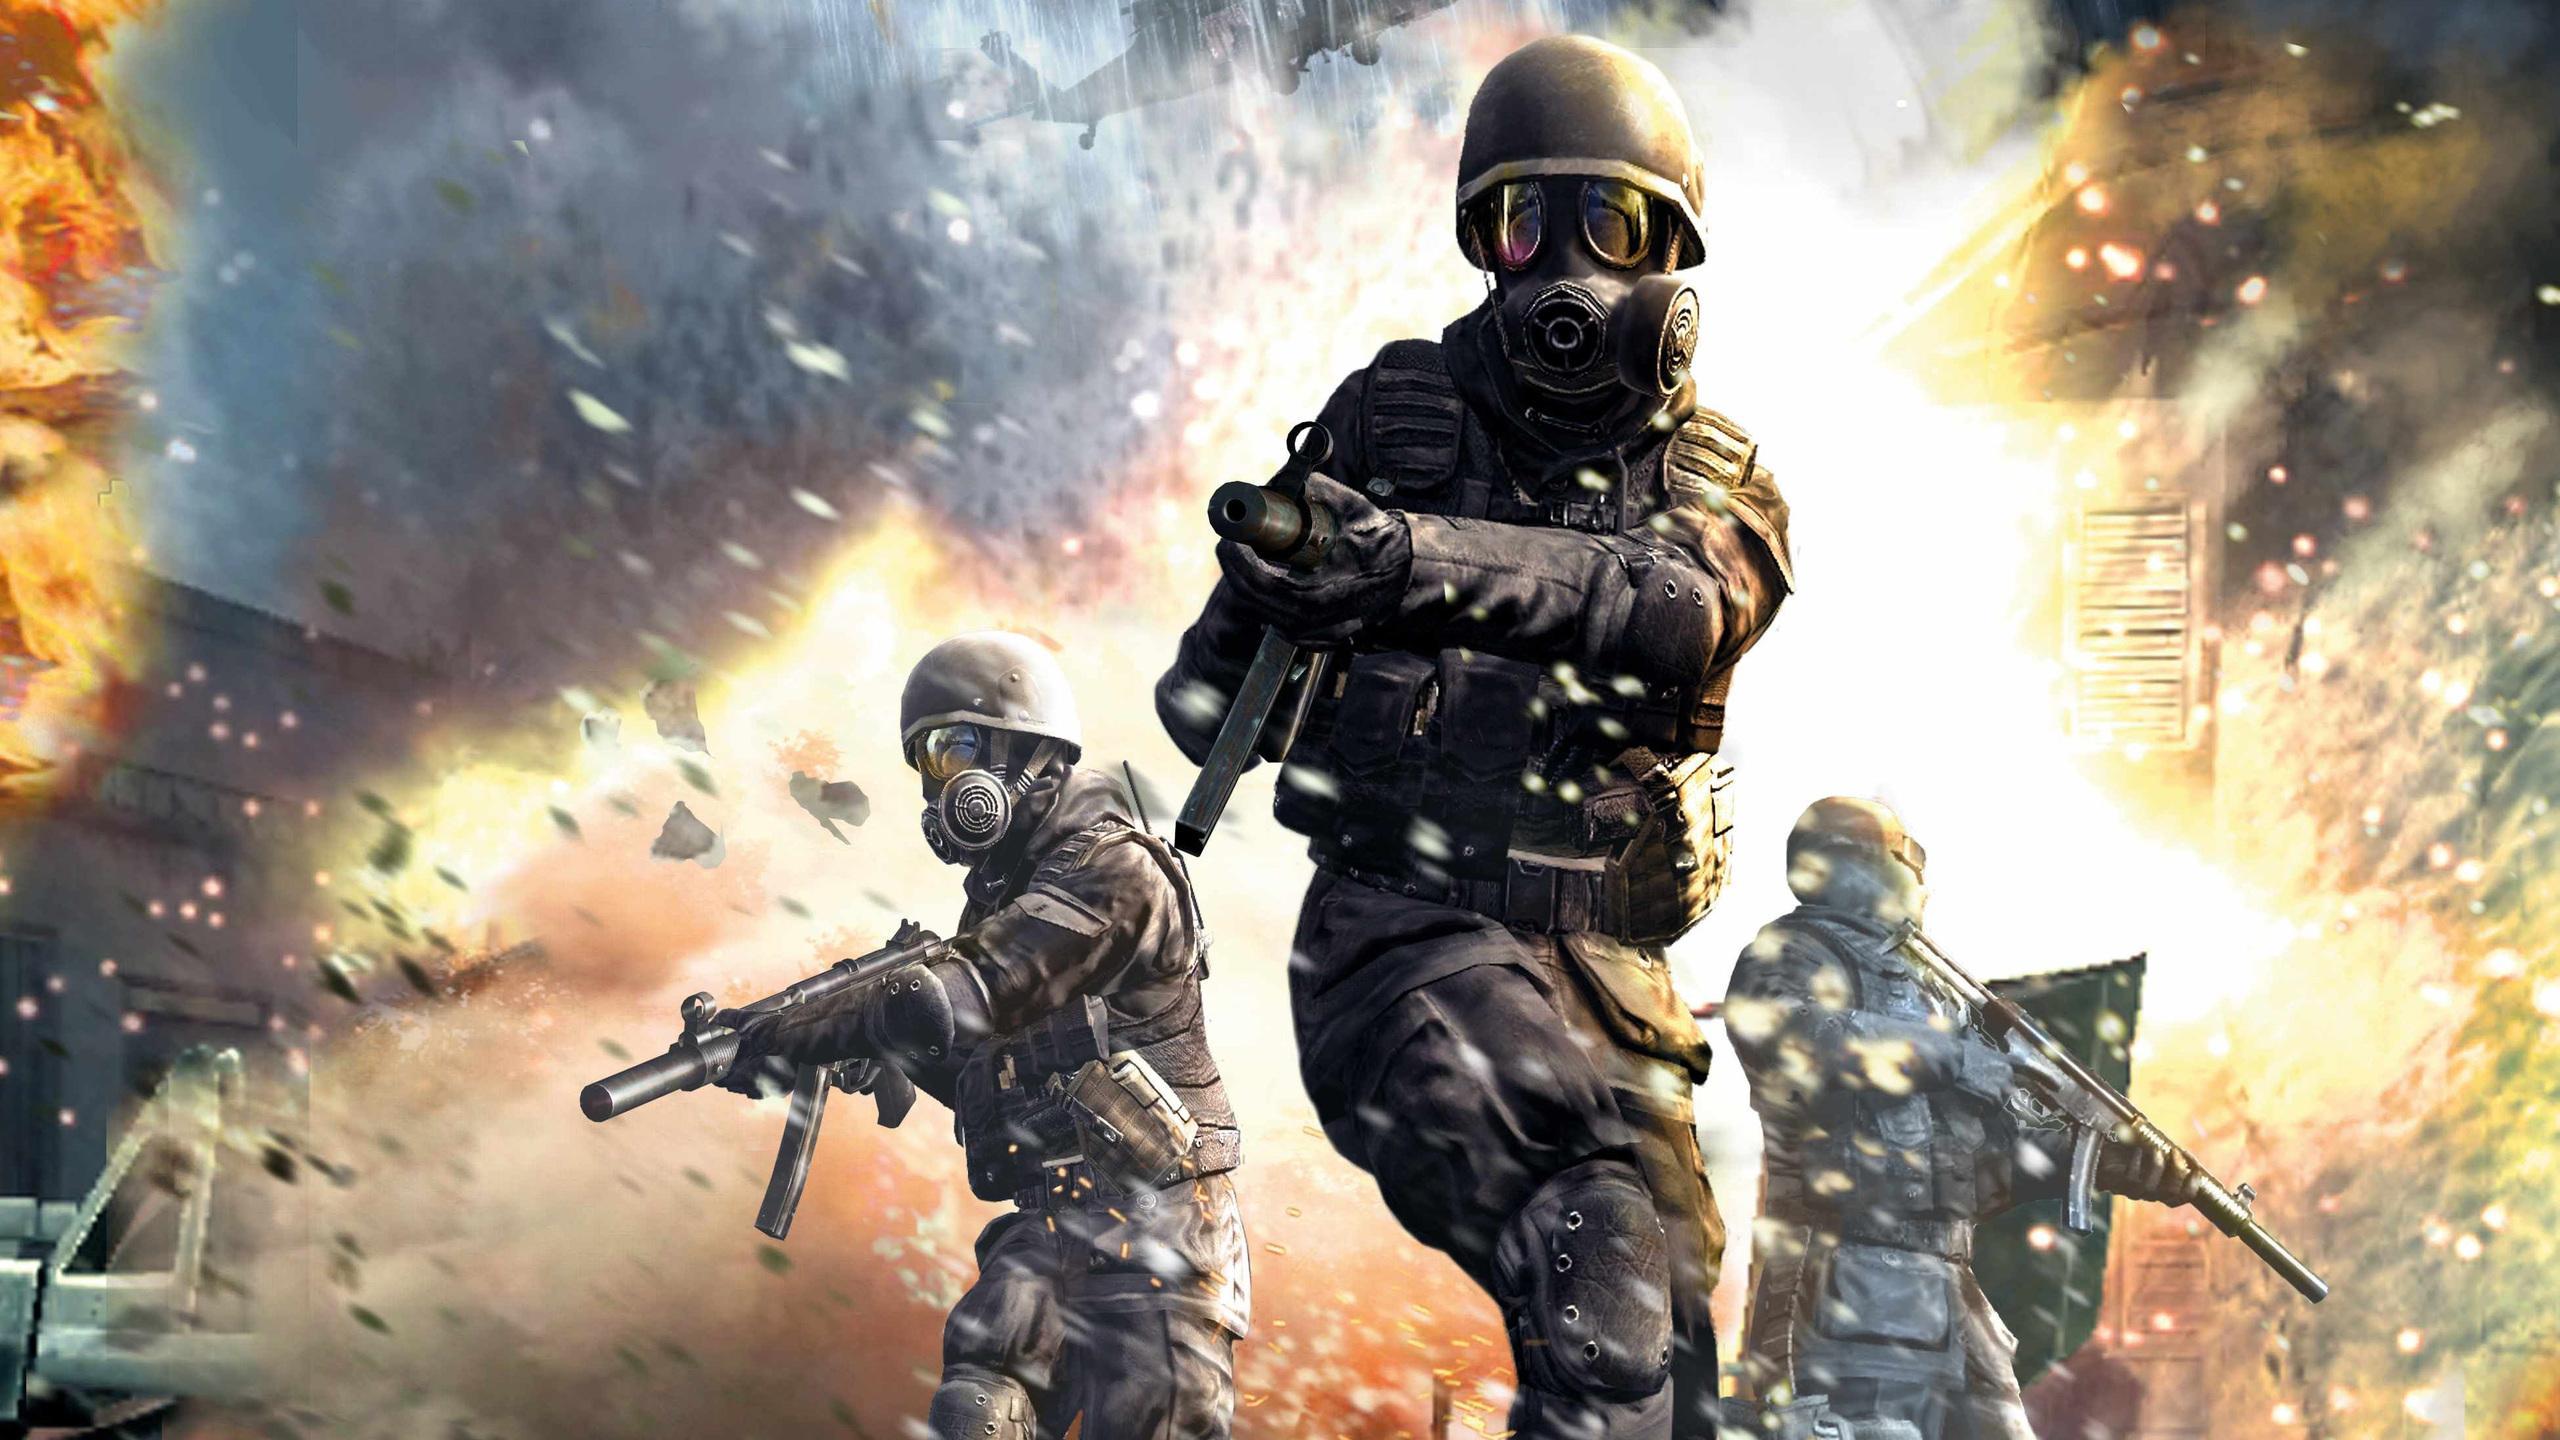 Modern Warfare 2019 Wallpapers - Wallpaper Cave